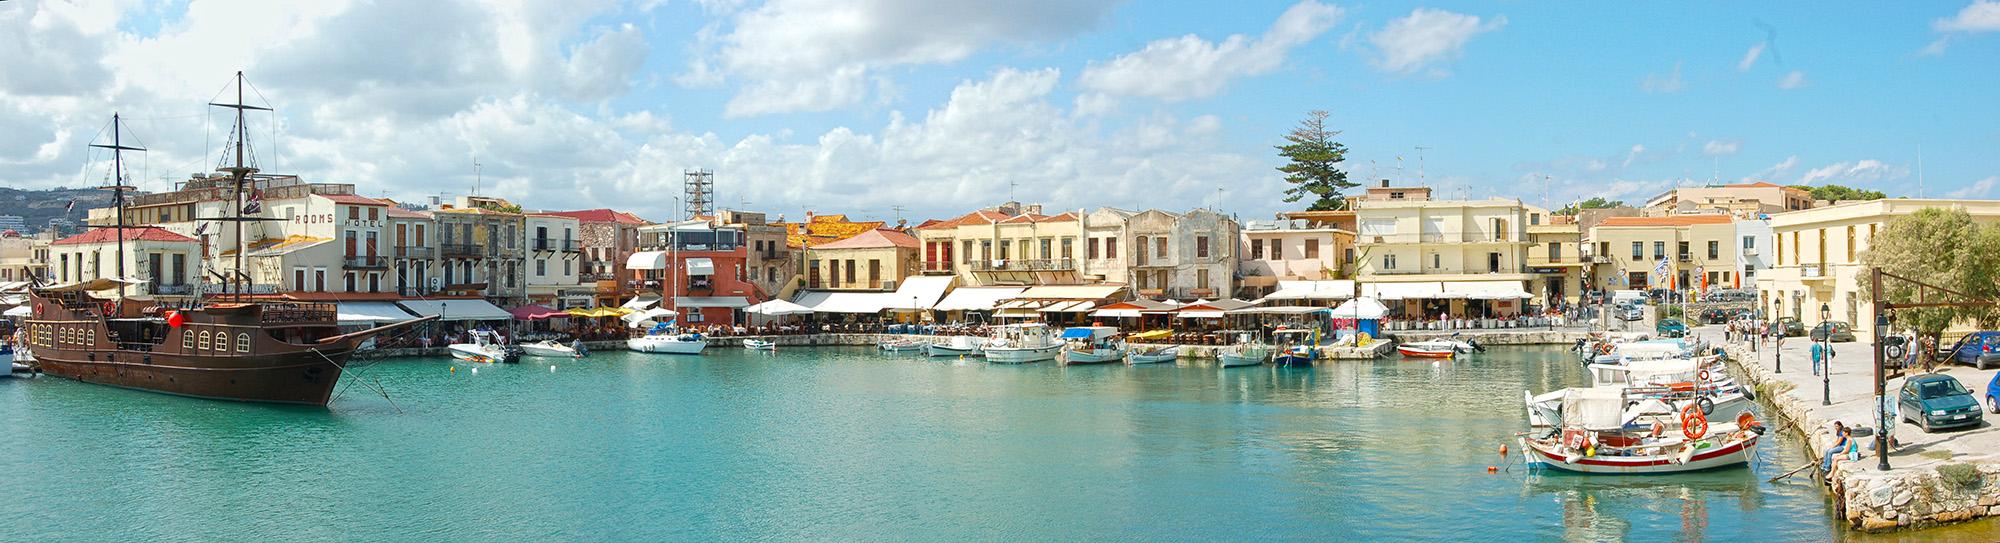 Rethymnon, Crete. A cosmopolitan city with plenty for everyone